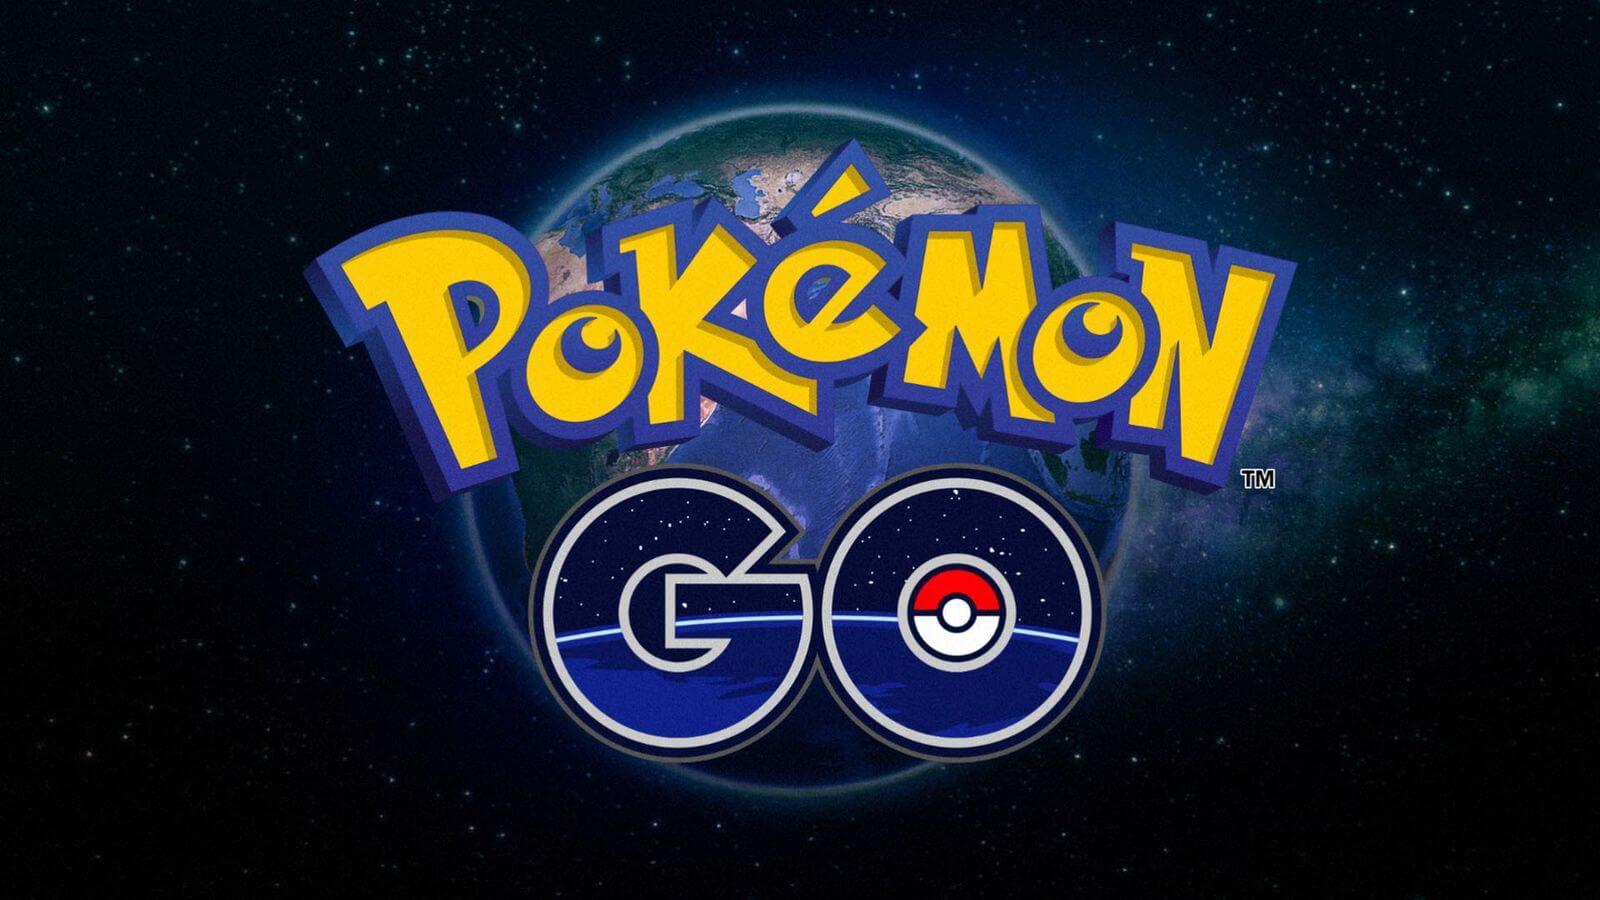 Pokemon Go Fun Facts